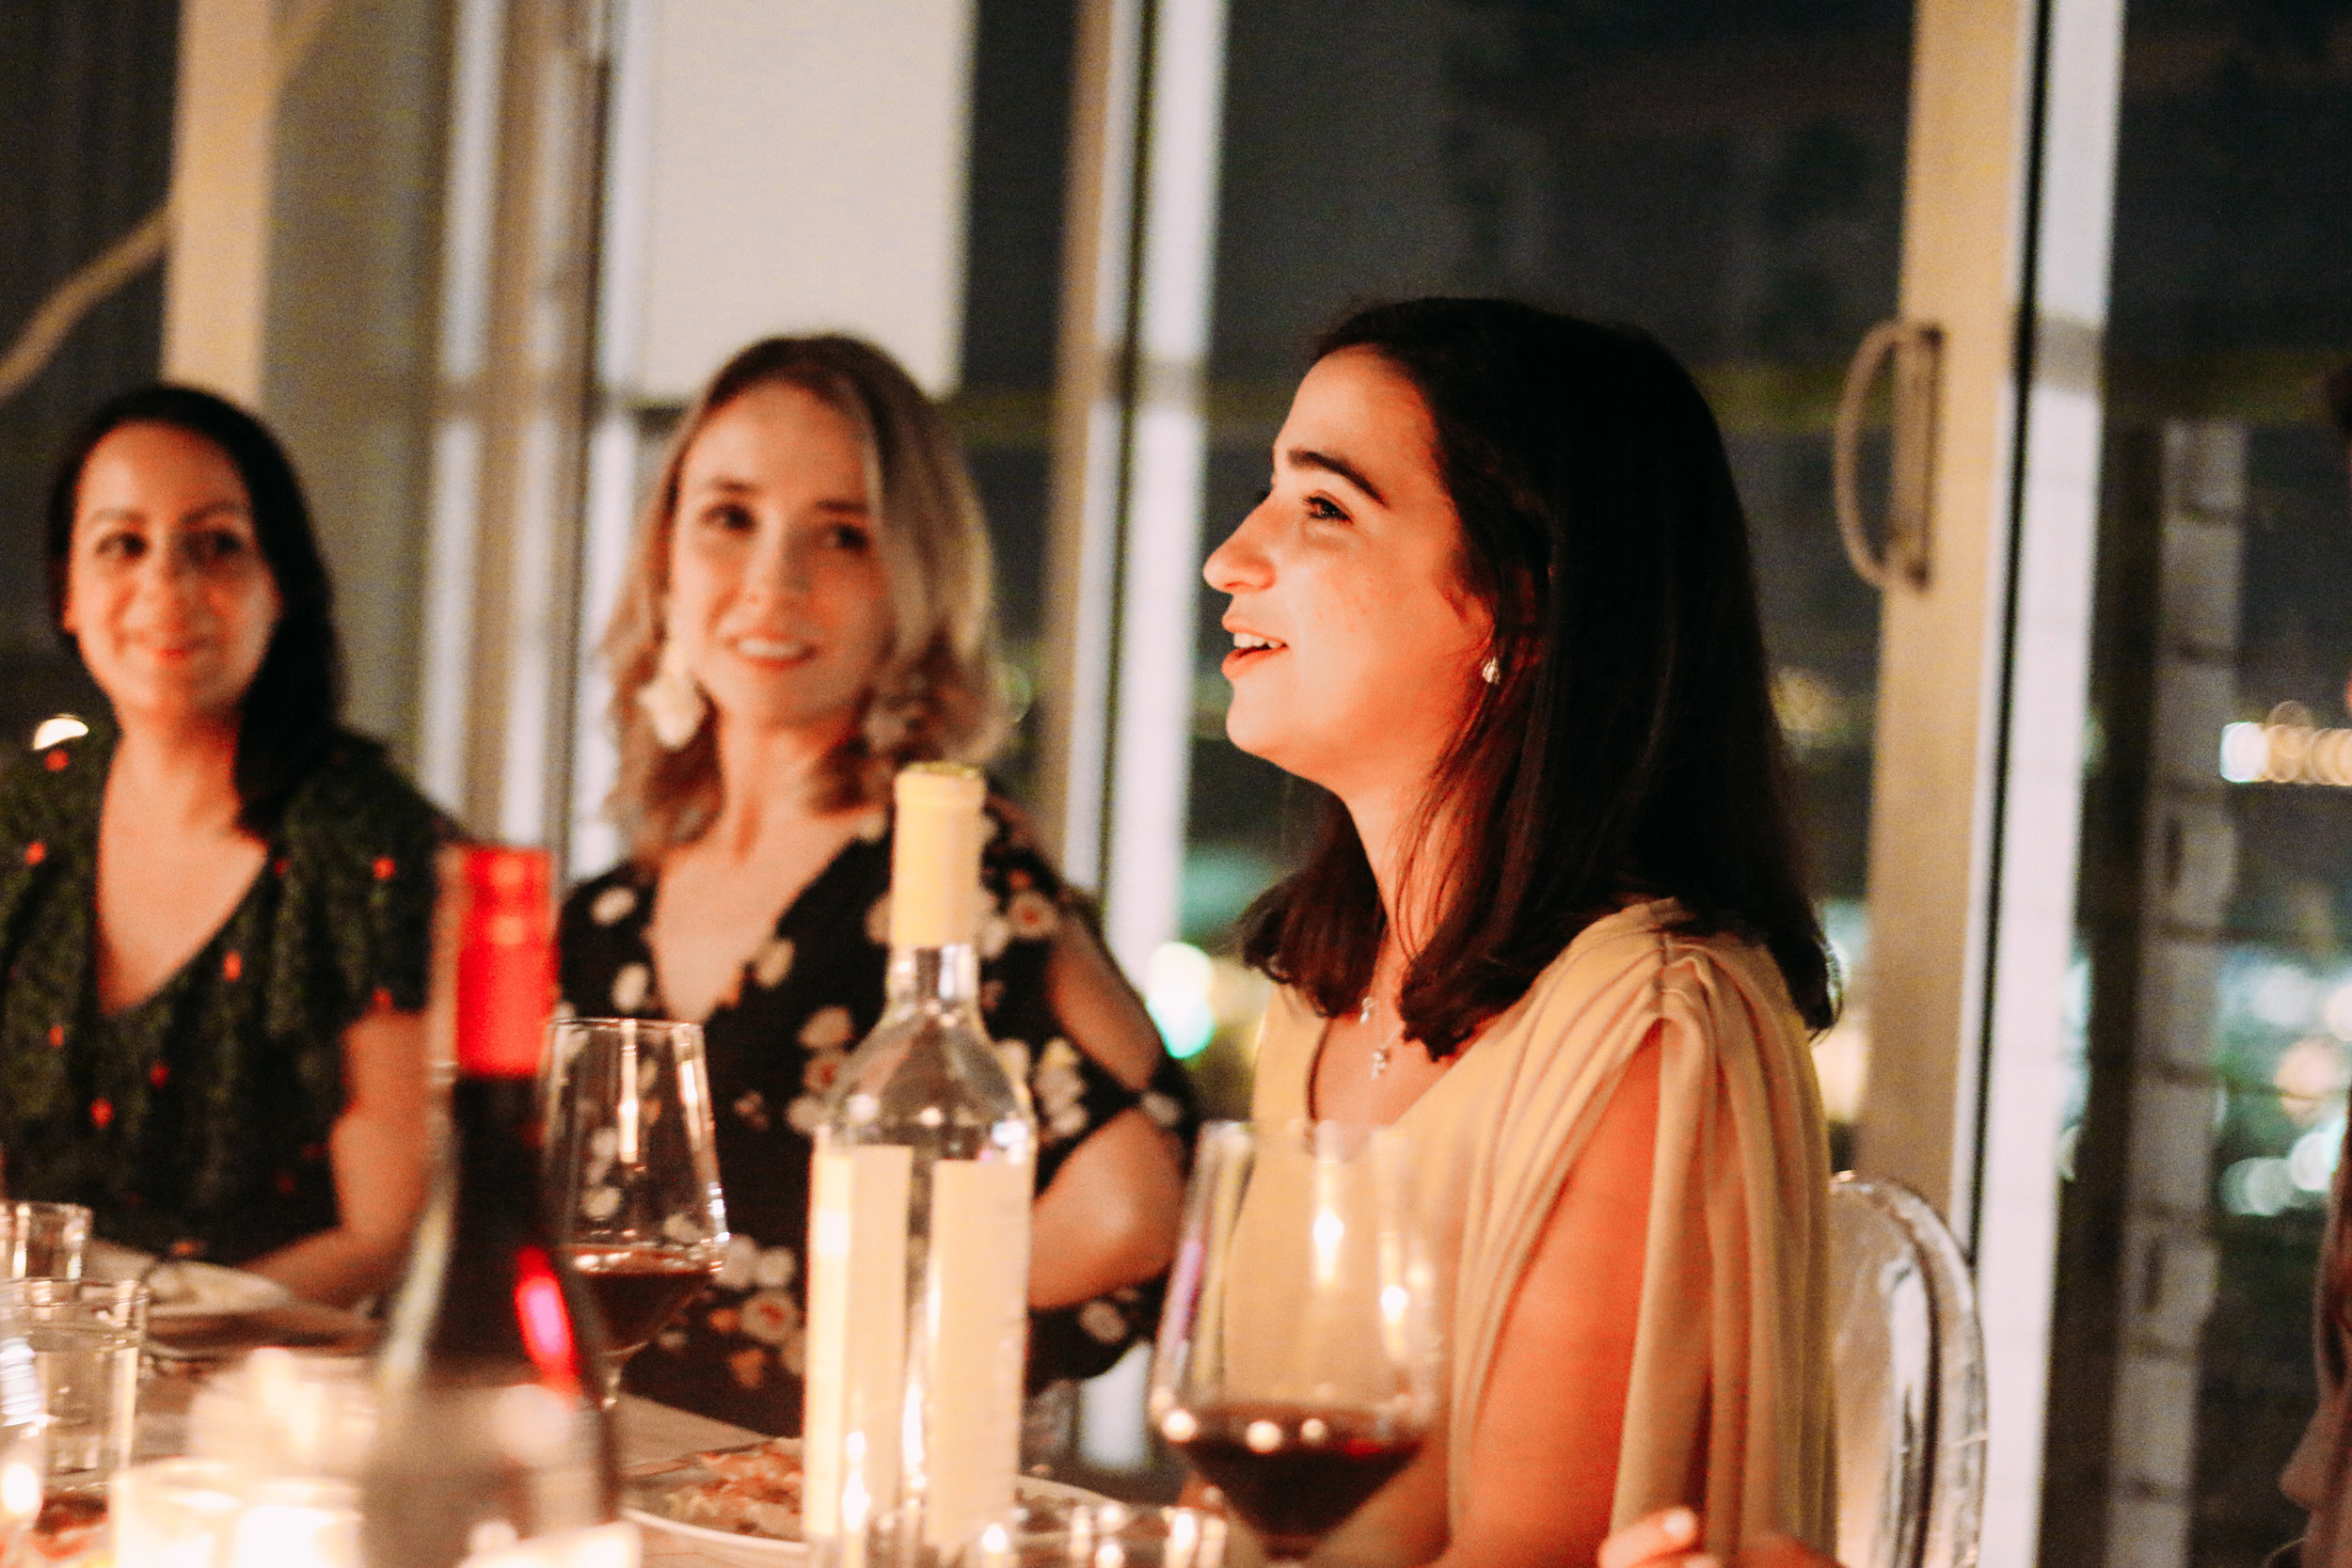 Women Who Wine Uncorked Conversations-Miami Wine Events-Wine Tasting Miami-69.jpg